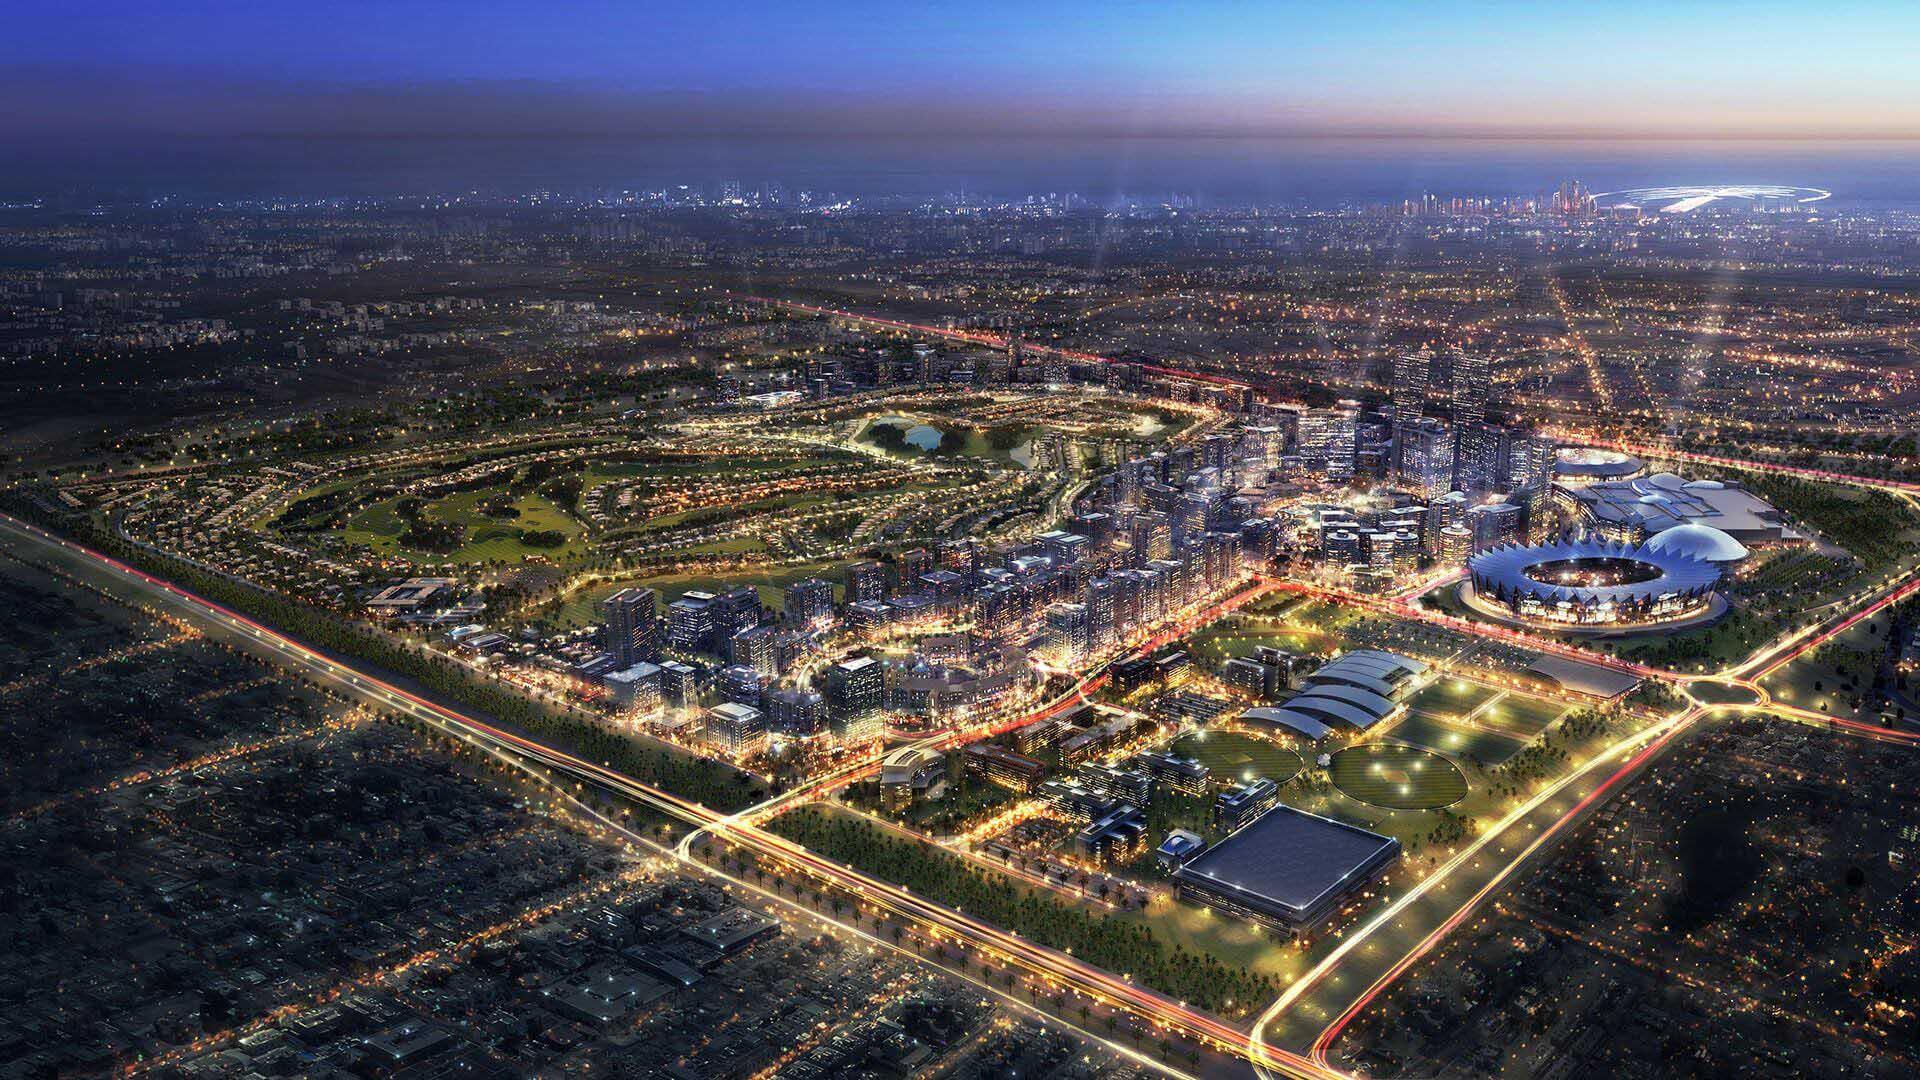 Ciudad Deportiva de Dubai - 3